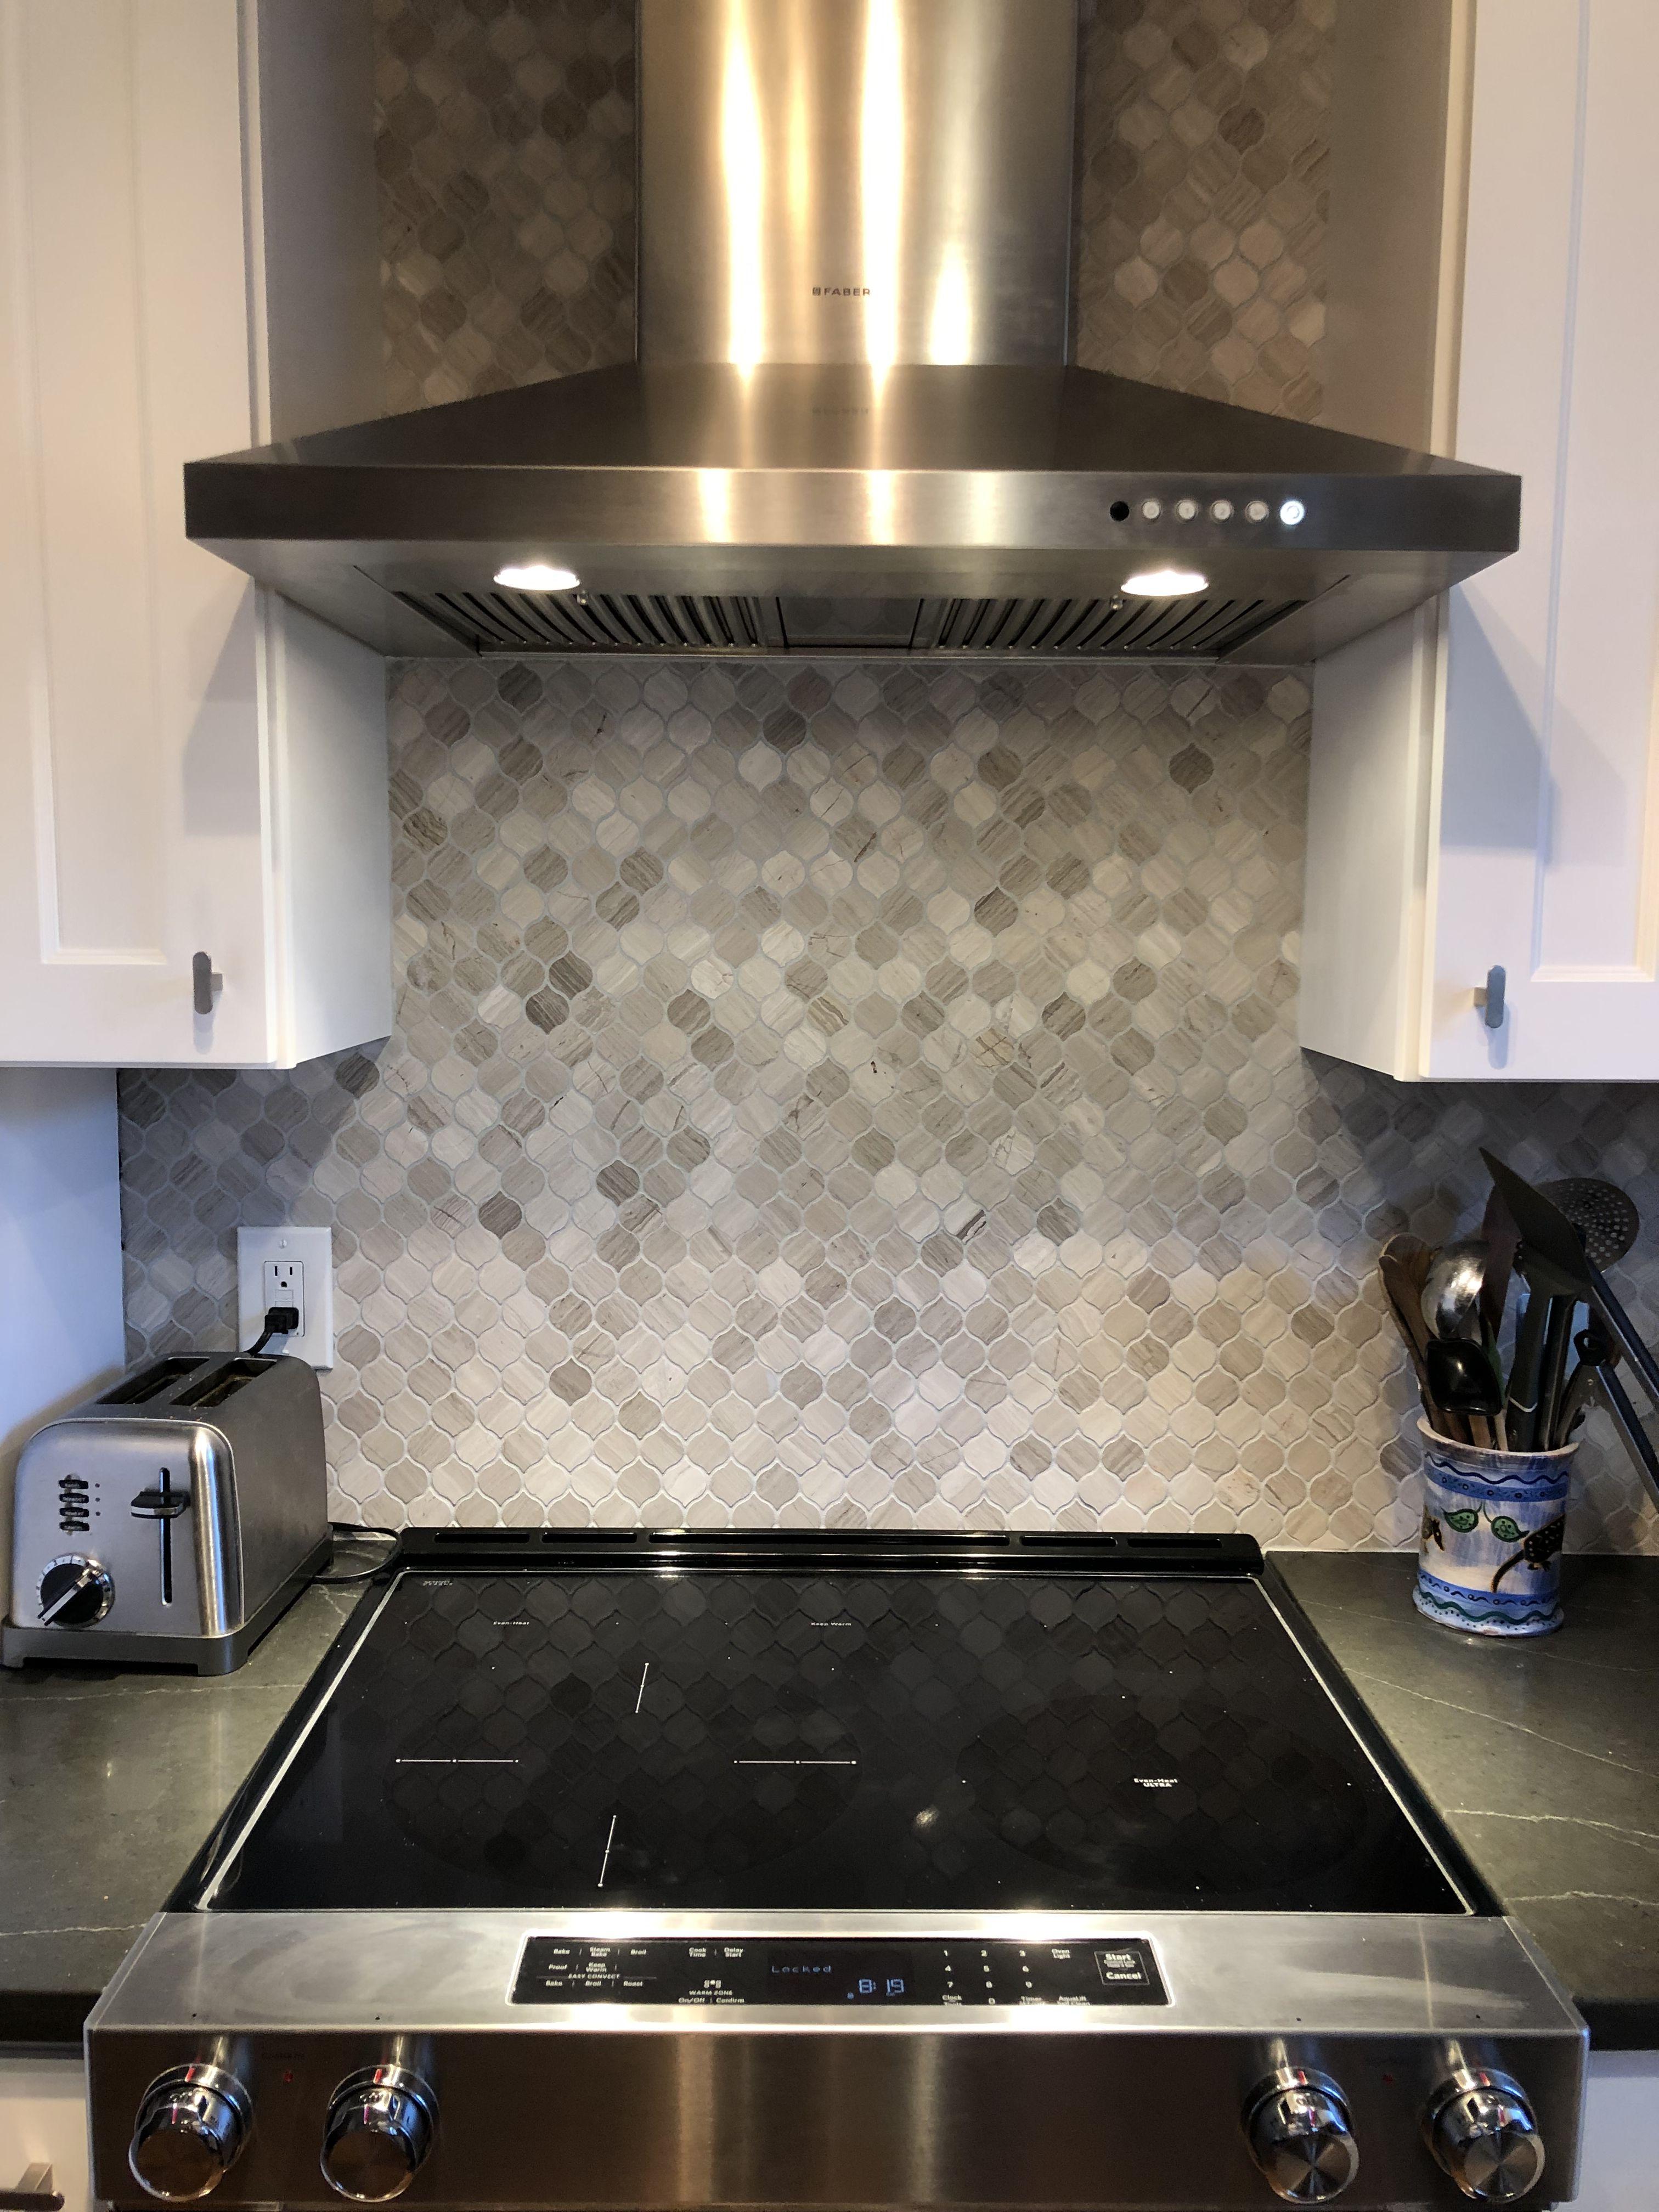 - Glazzio Tile, Kitchen Reno, #Farber Range Hood, Kitchen Aid Stove